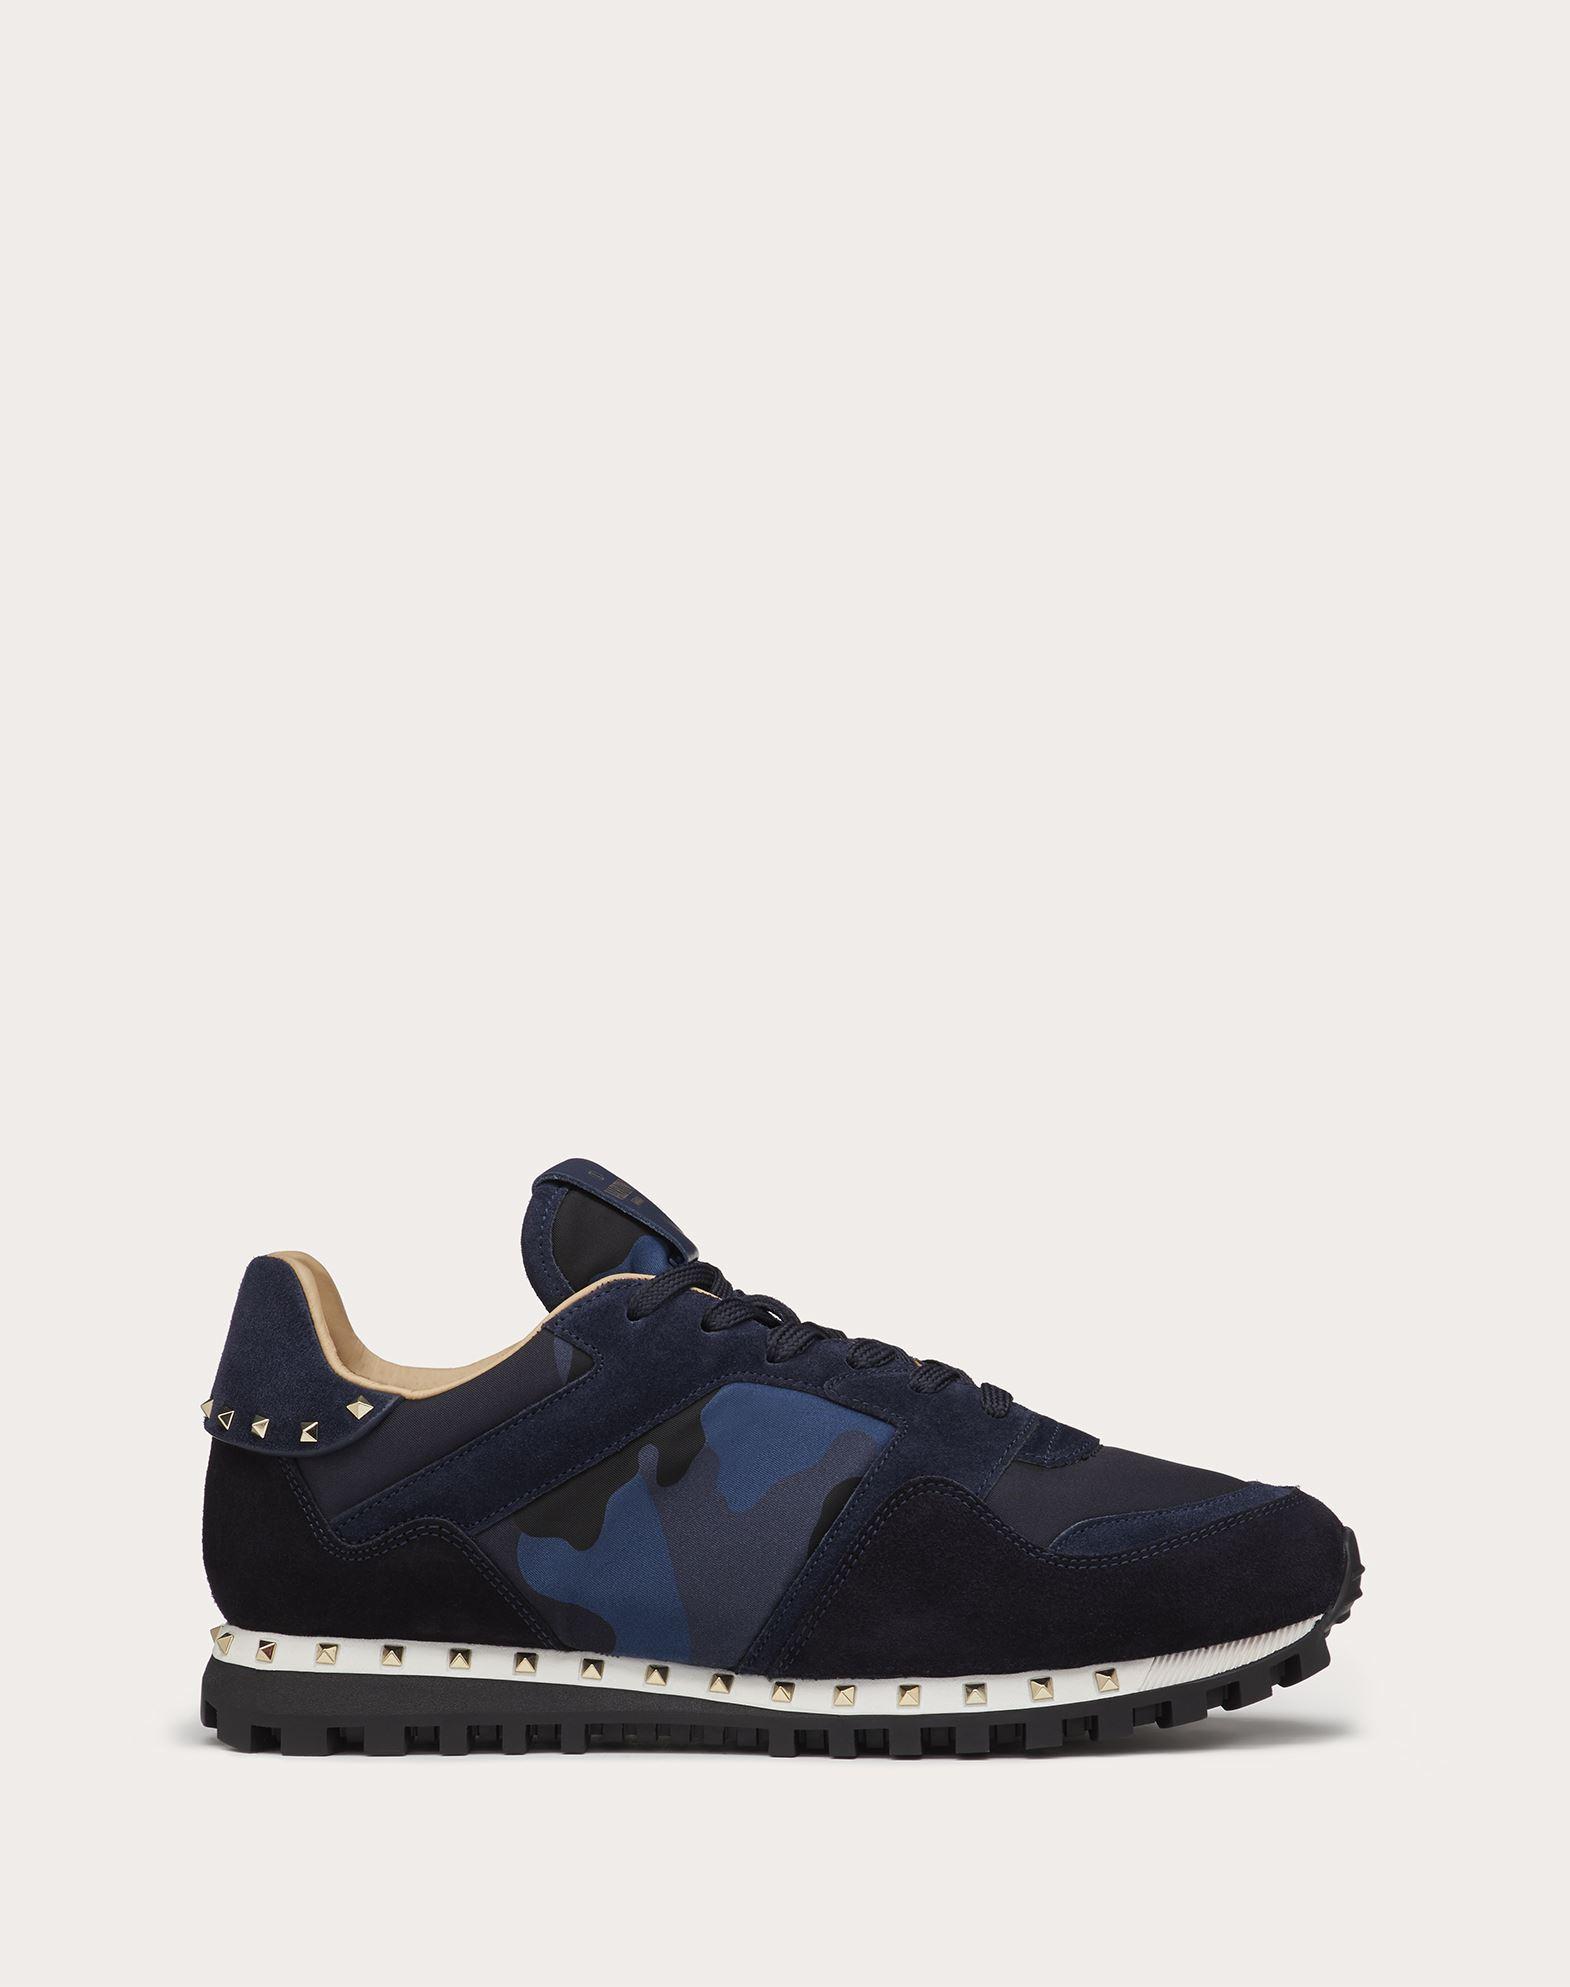 VALENTINO GARAVANI UOMO Sneaker Camuflaje LOW-TOP SNEAKERS U f